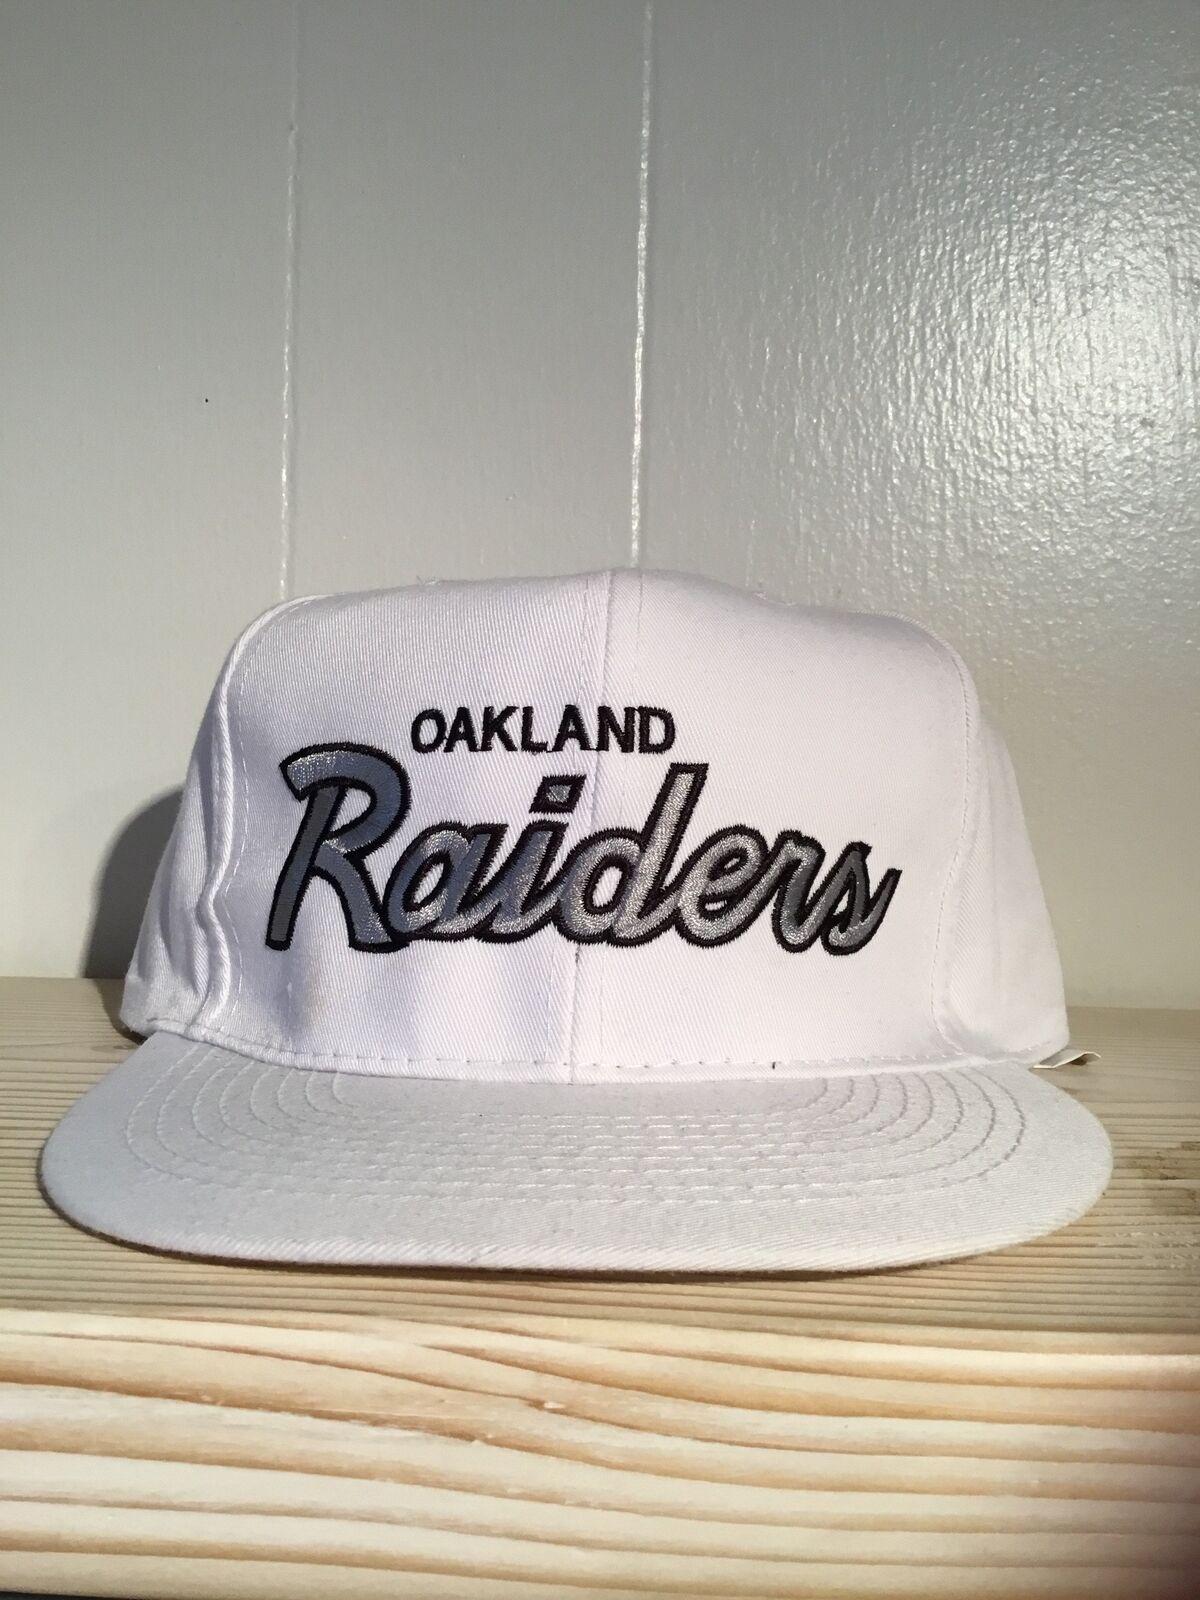 fdfac943817 Vintage 80s 90s Oakland Raiders Snapback Hat for sale online